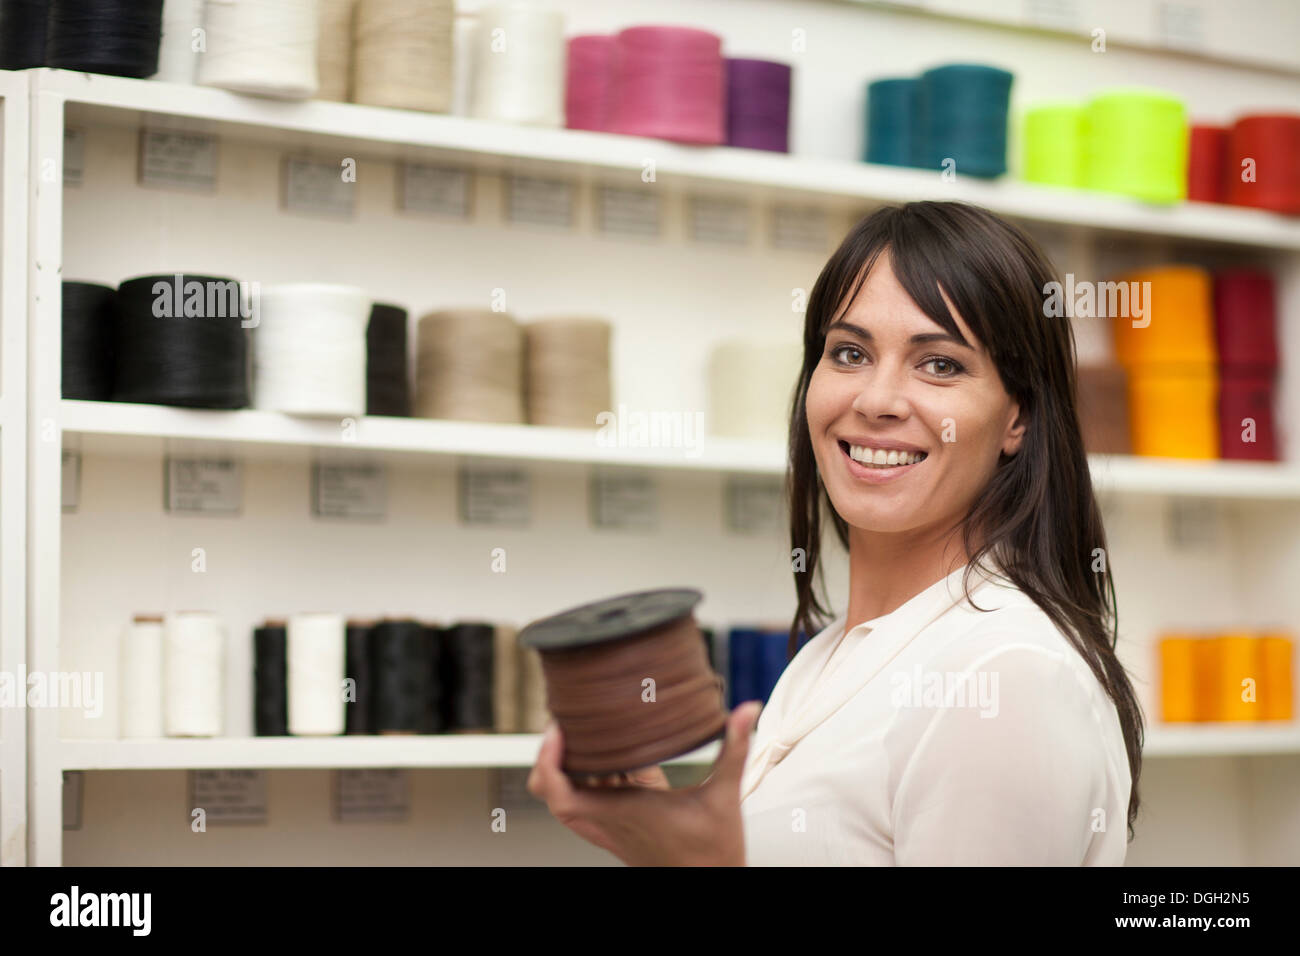 Woman holding spool of thread - Stock Image